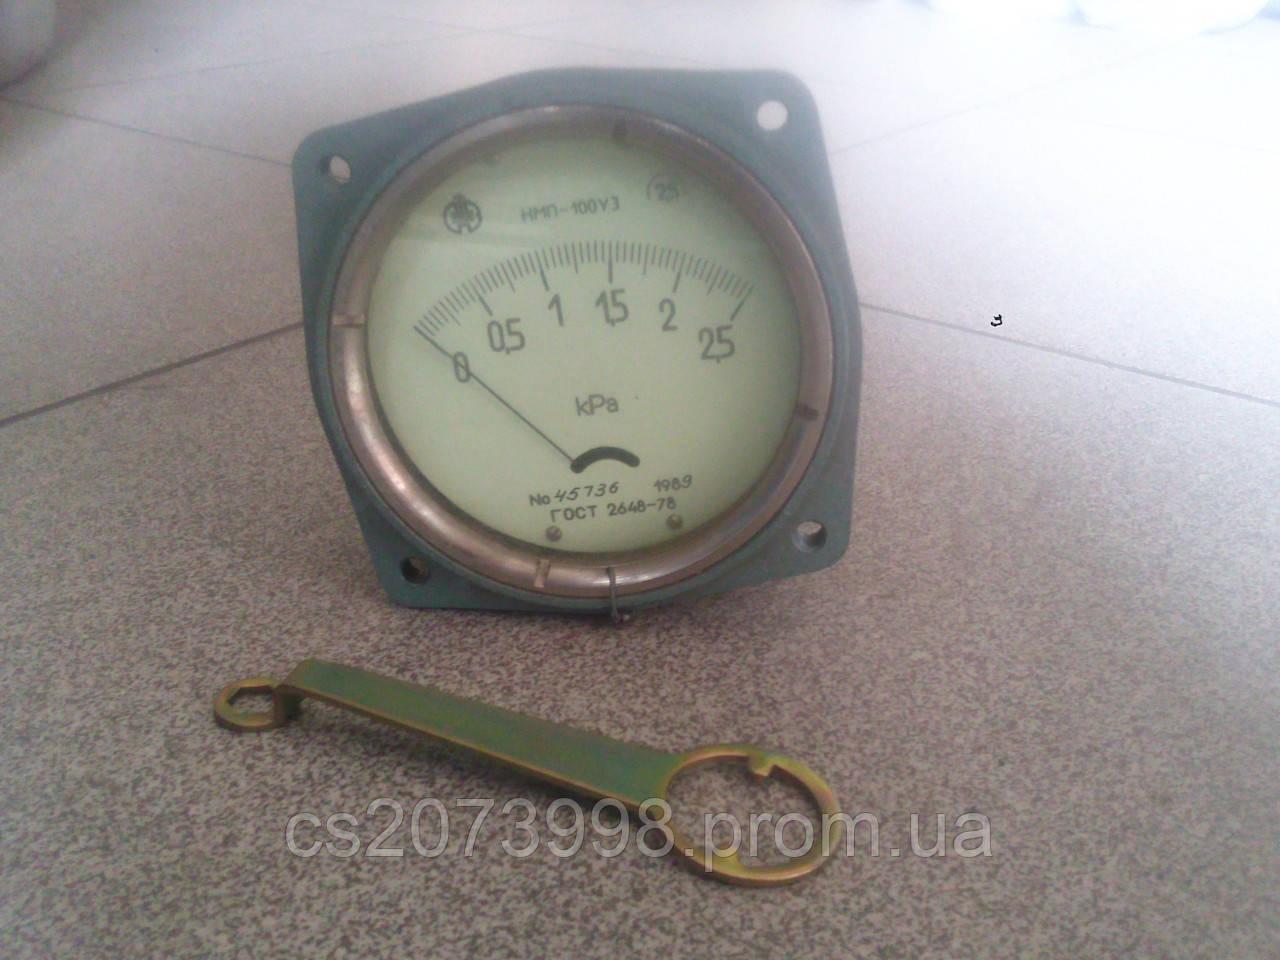 Вакуумметр, тягомер мембранный показывающий ТмМП-100 ТУ 25-02-1730 сеялка СУПН8-01